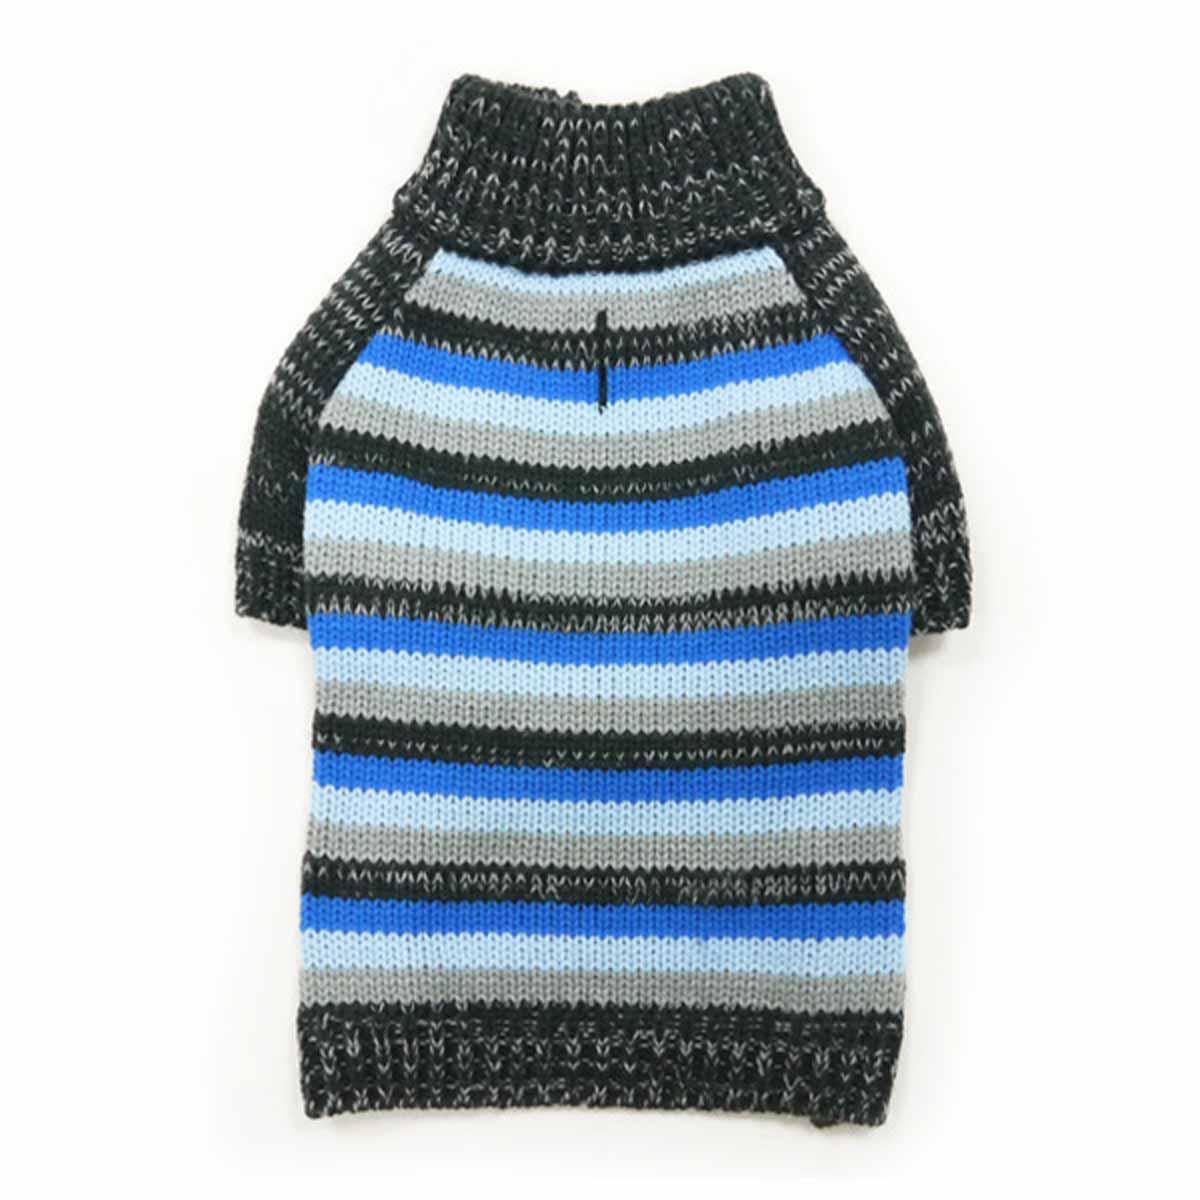 Marl Stripes Dog Sweater by Dogo - Blue